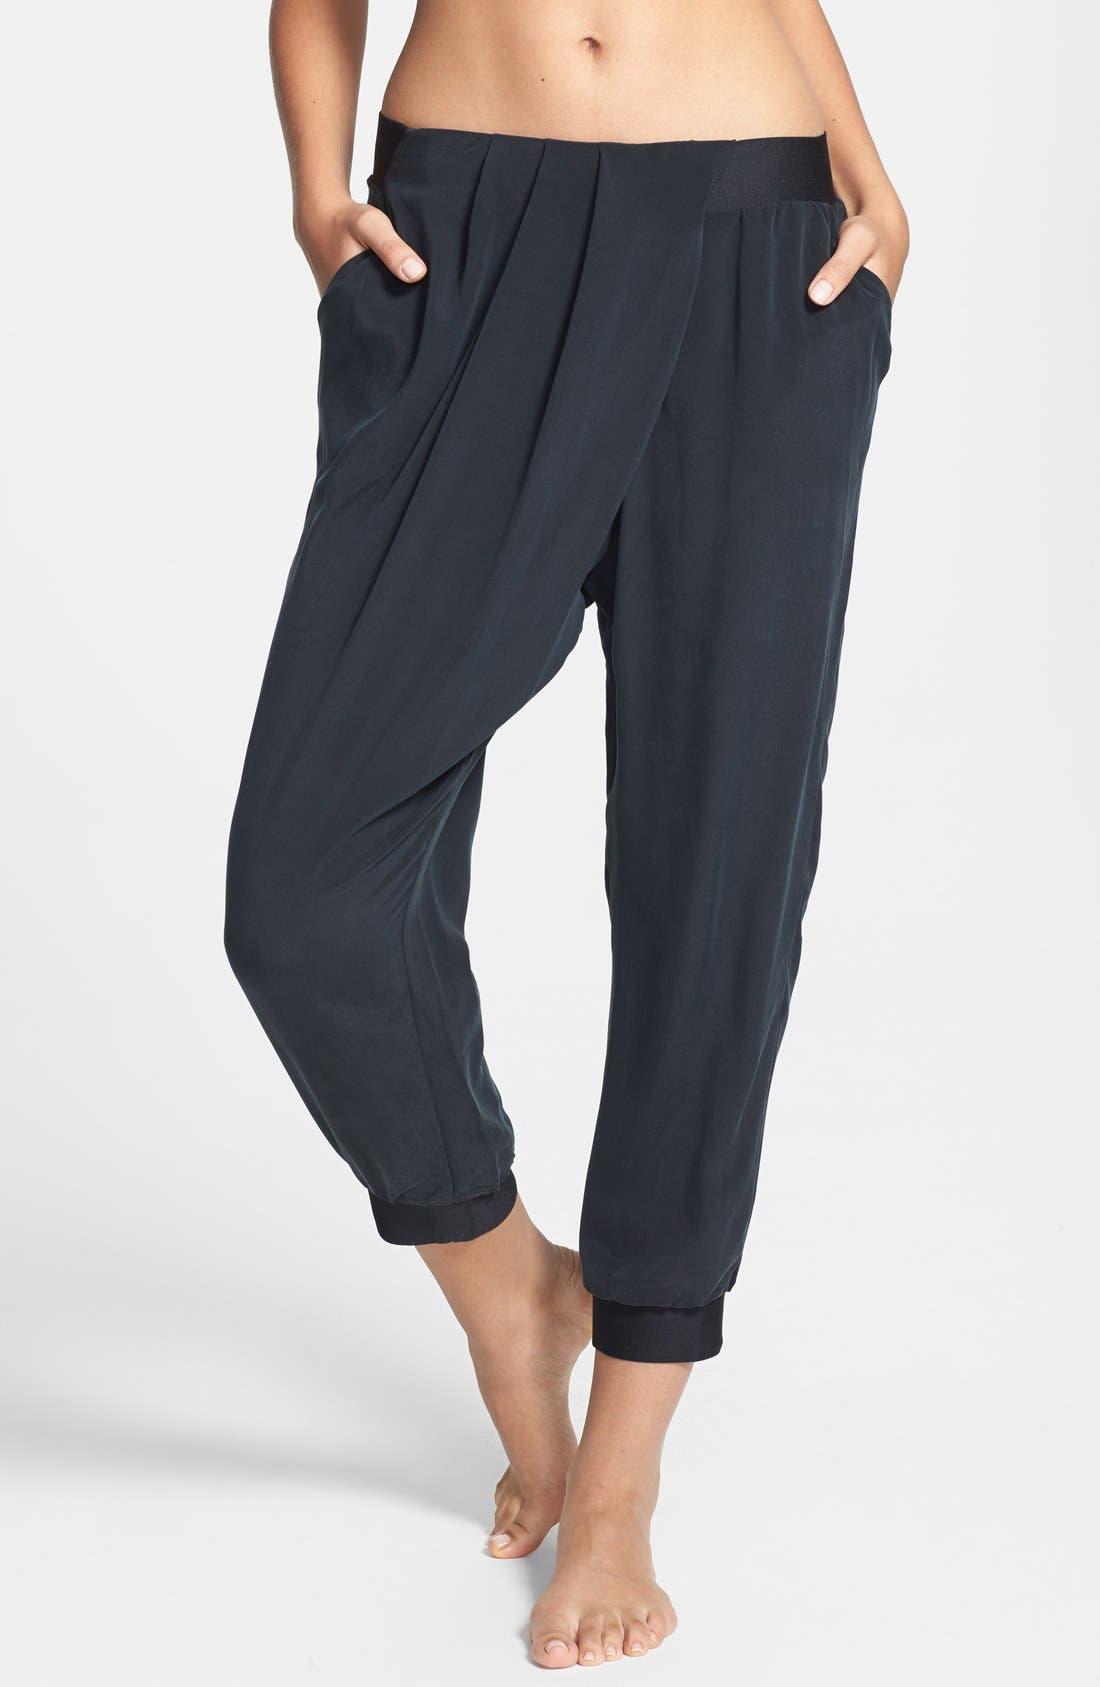 Alternate Image 1 Selected - Lole 'Asha' Silk Capri Pants